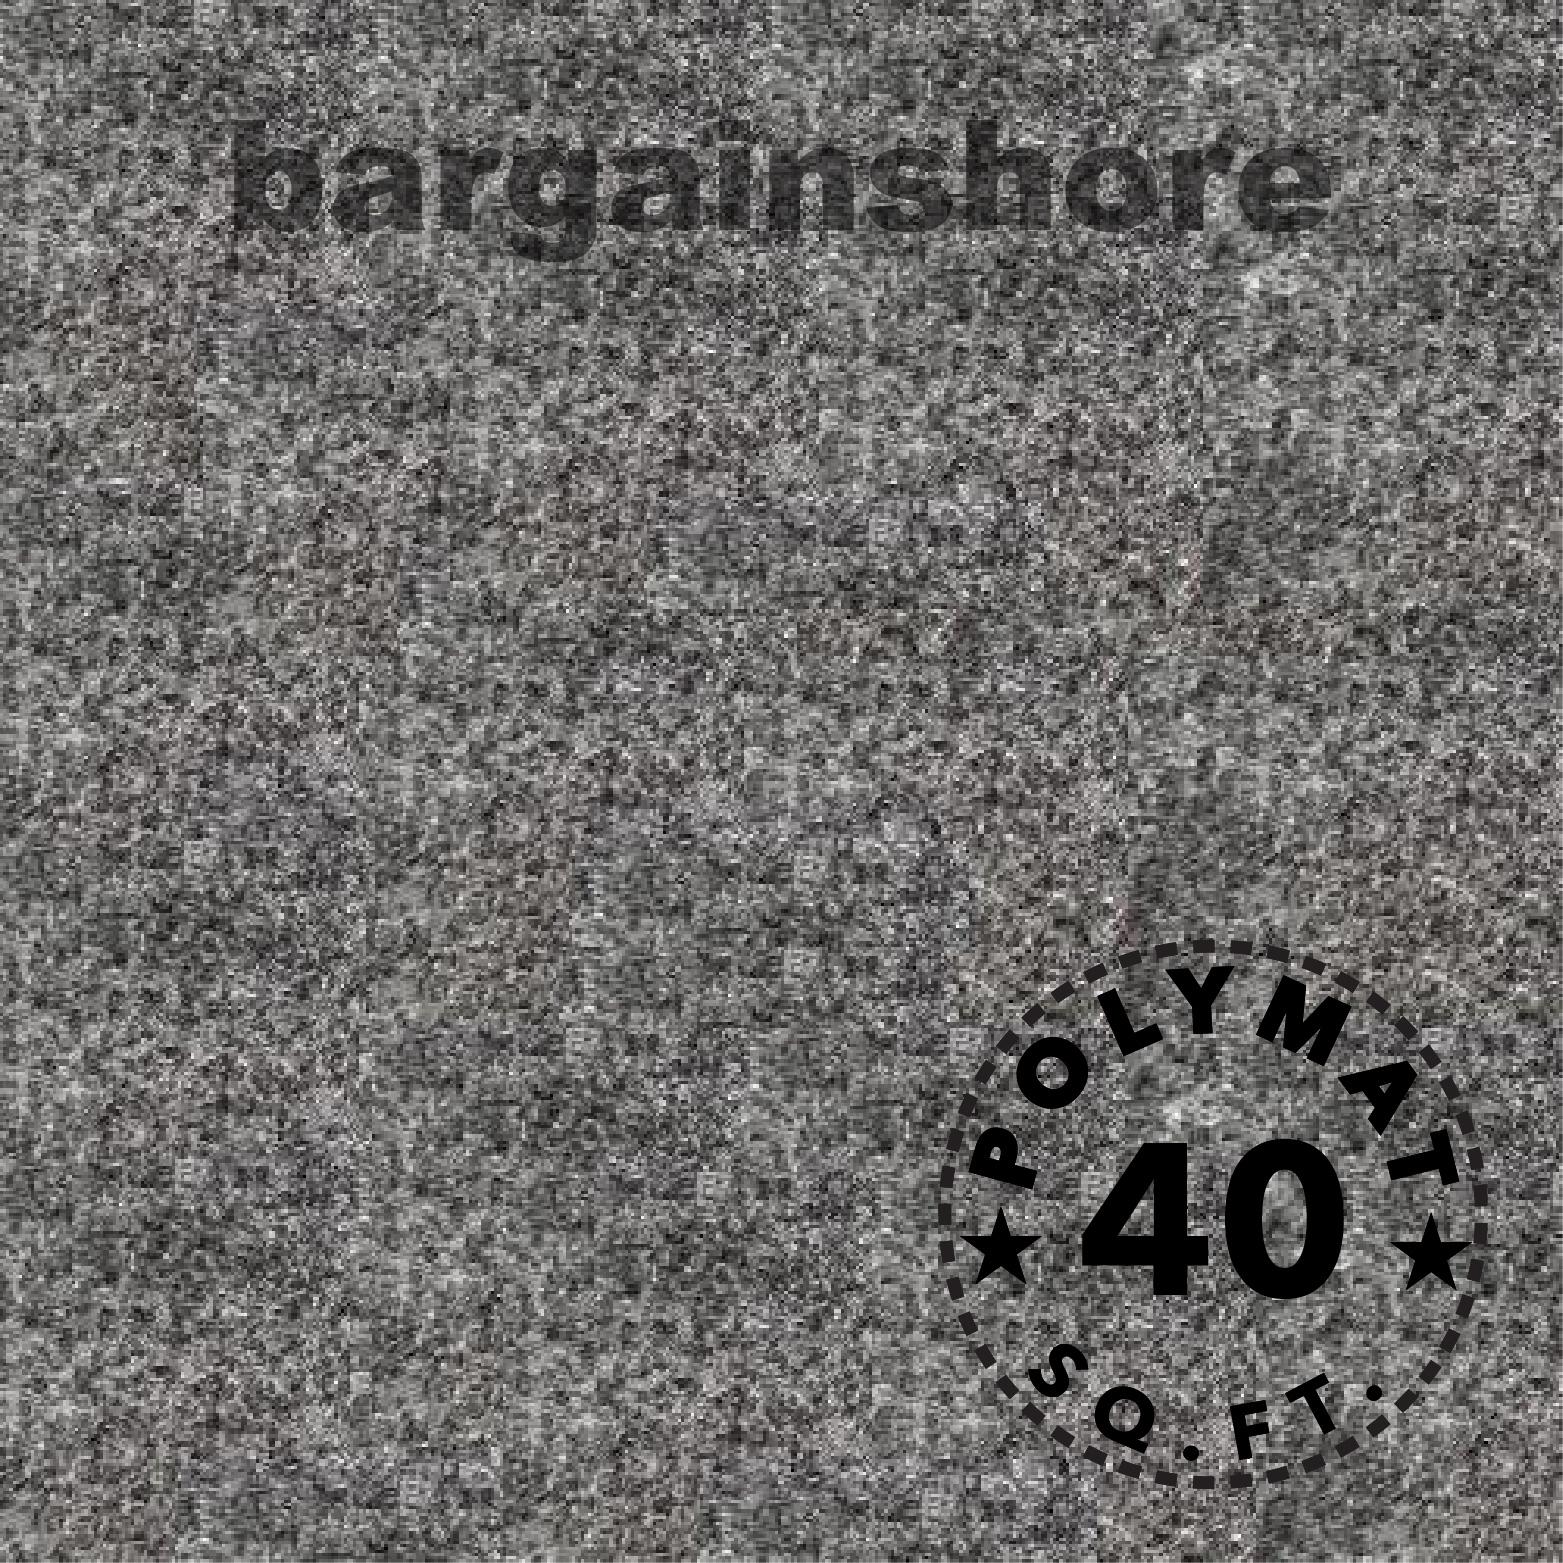 10 Feet Long by 3.75 Feet Wide Polymat Charcoal / Dark Grey Nonwoven Felt Fabric Carpet - Multipurpose Backed Felt Fabric for Car Truck RV Van Trunk & Interior Liner